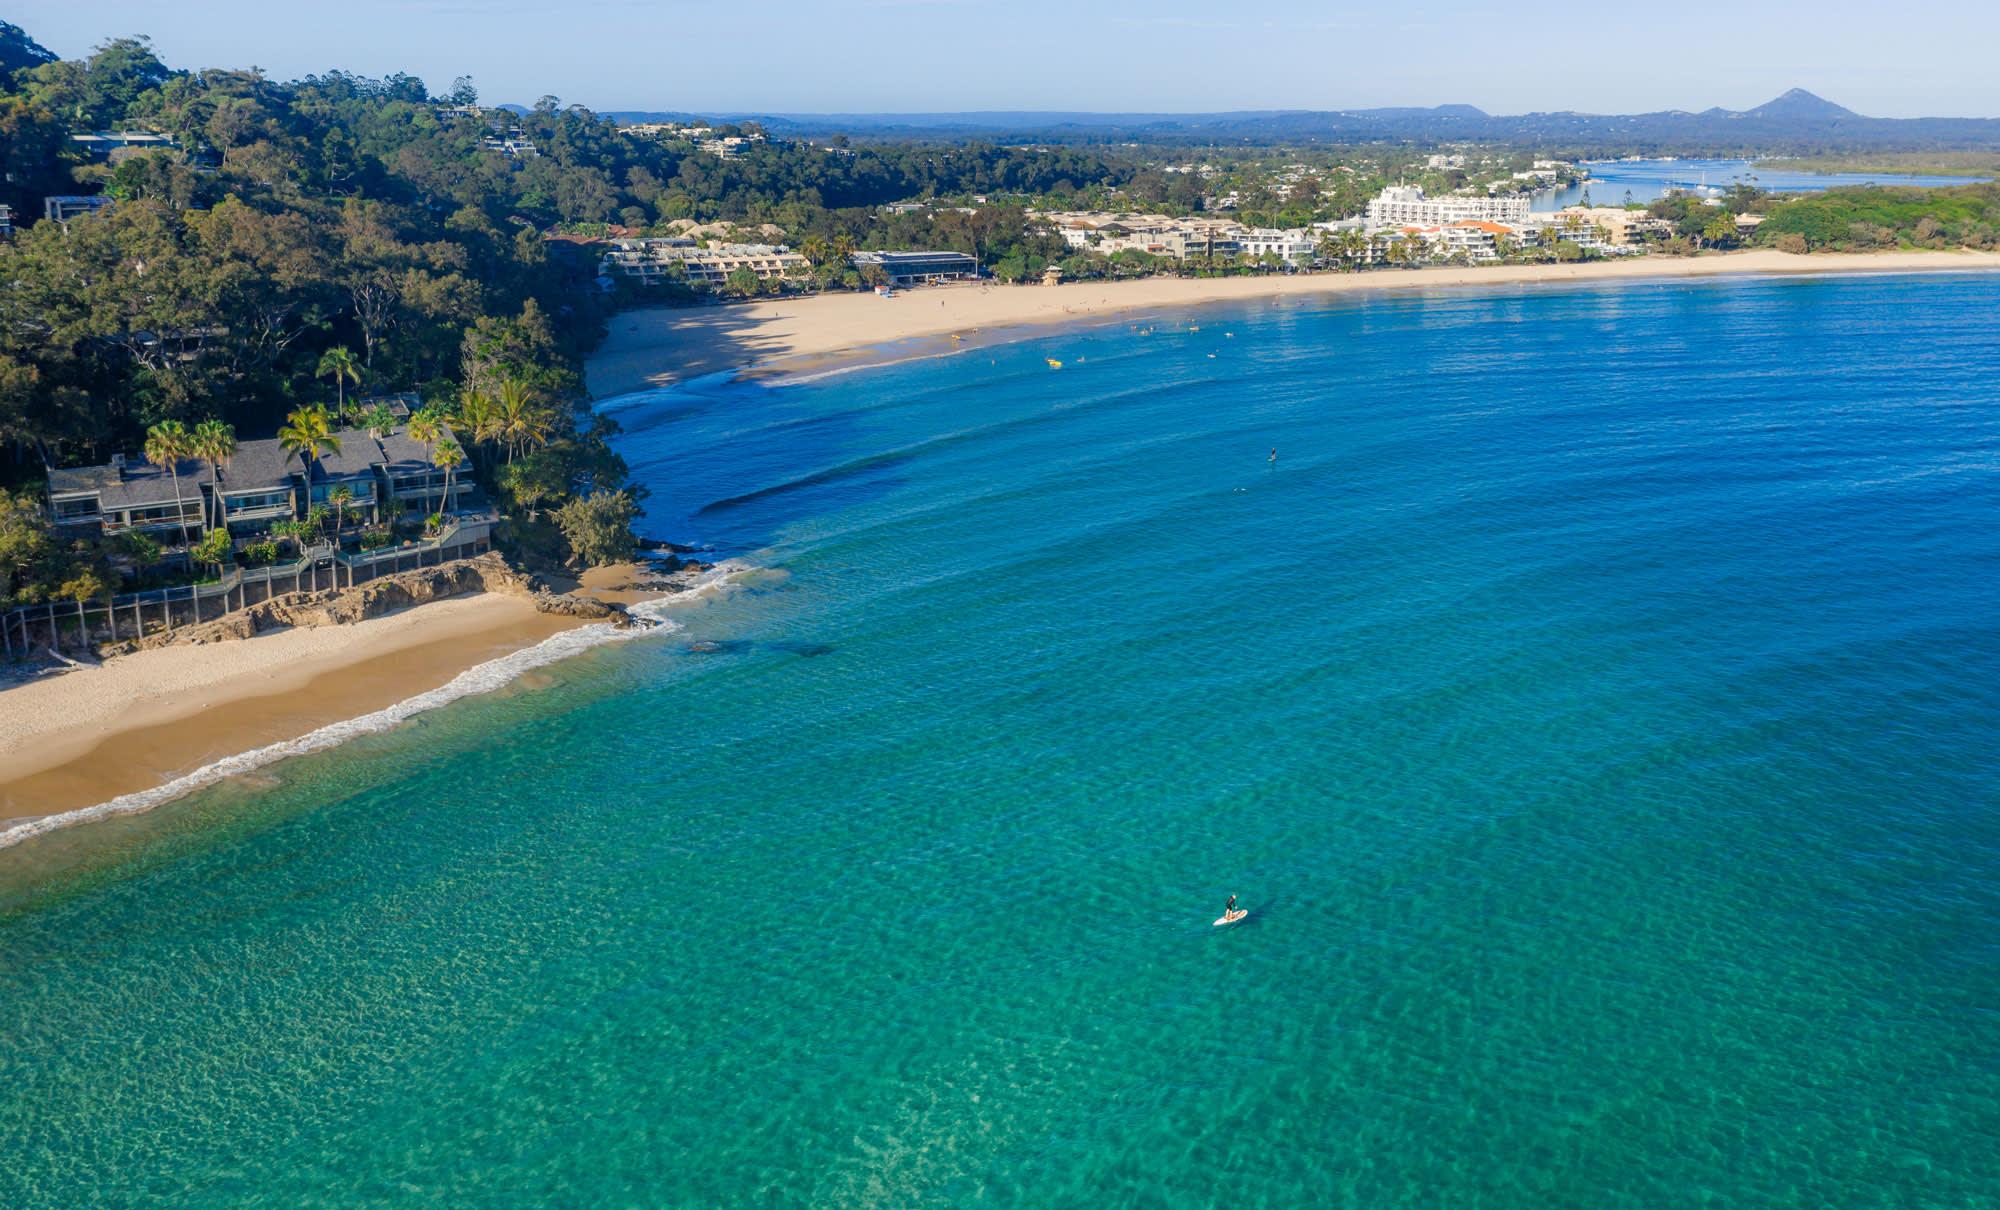 Day 1 – Noosa Main Beach